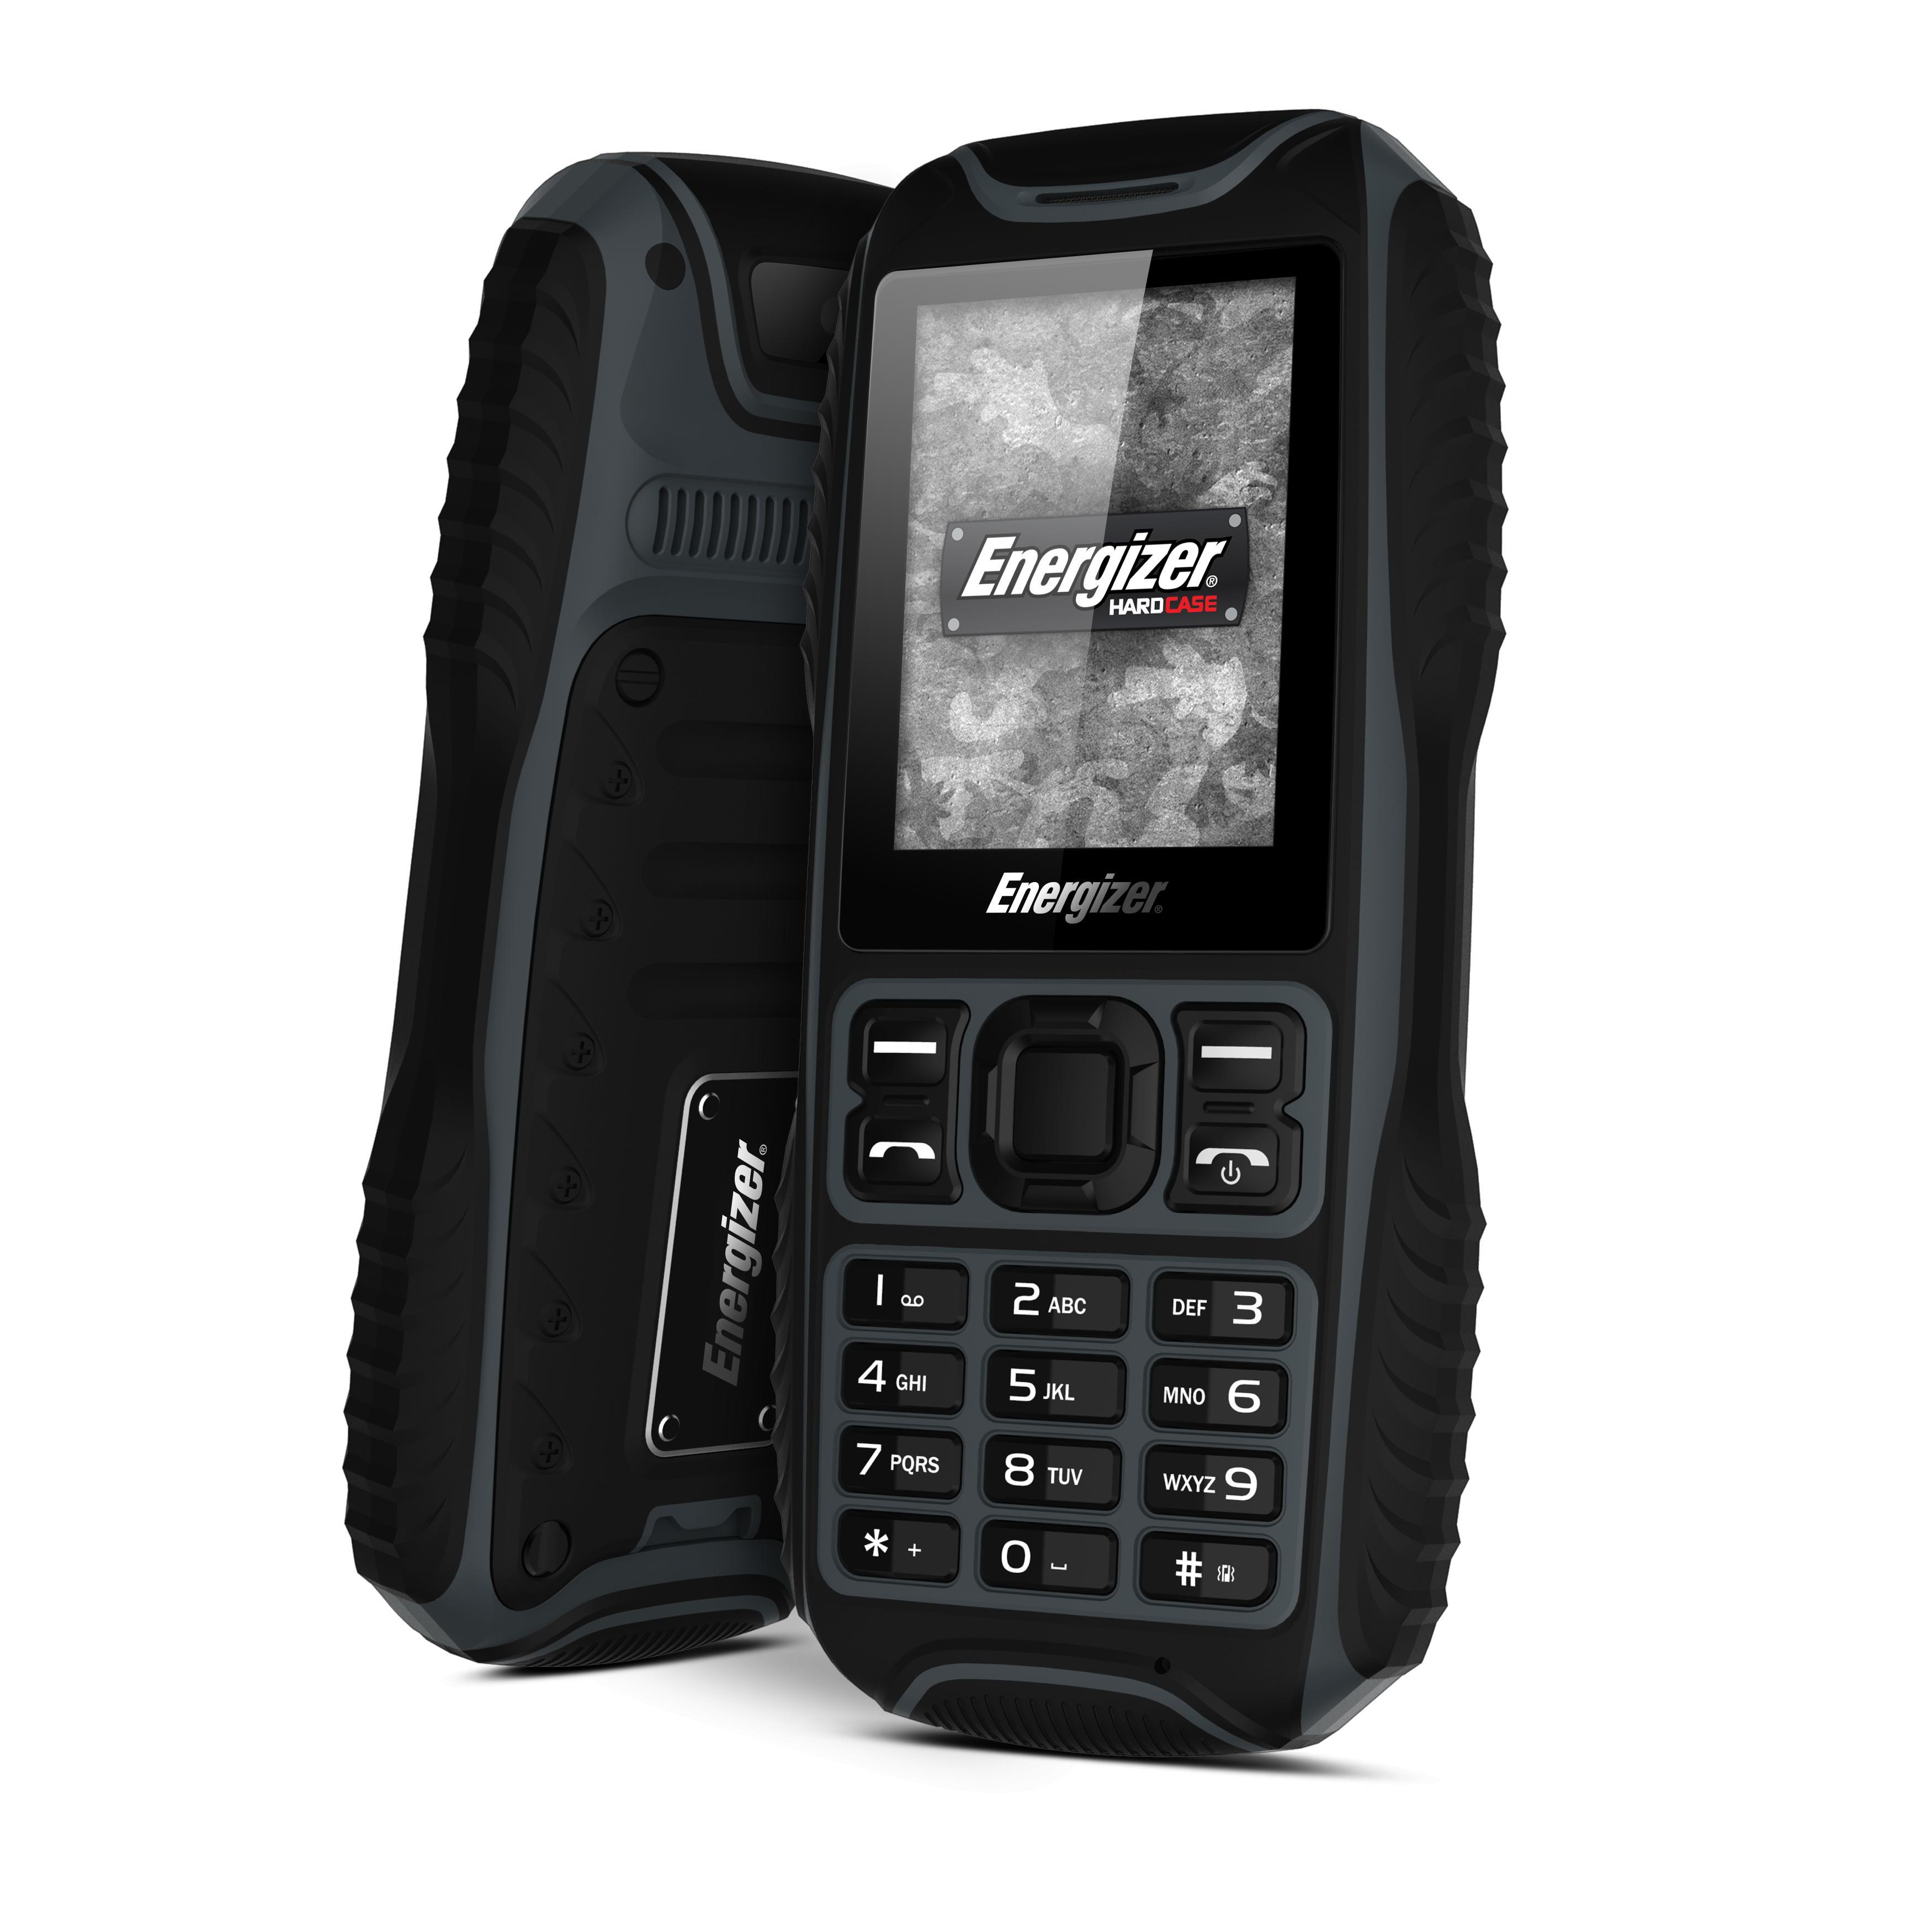 Téléphone Durci Energizer Energy 200 8 Go Double SIM Noir